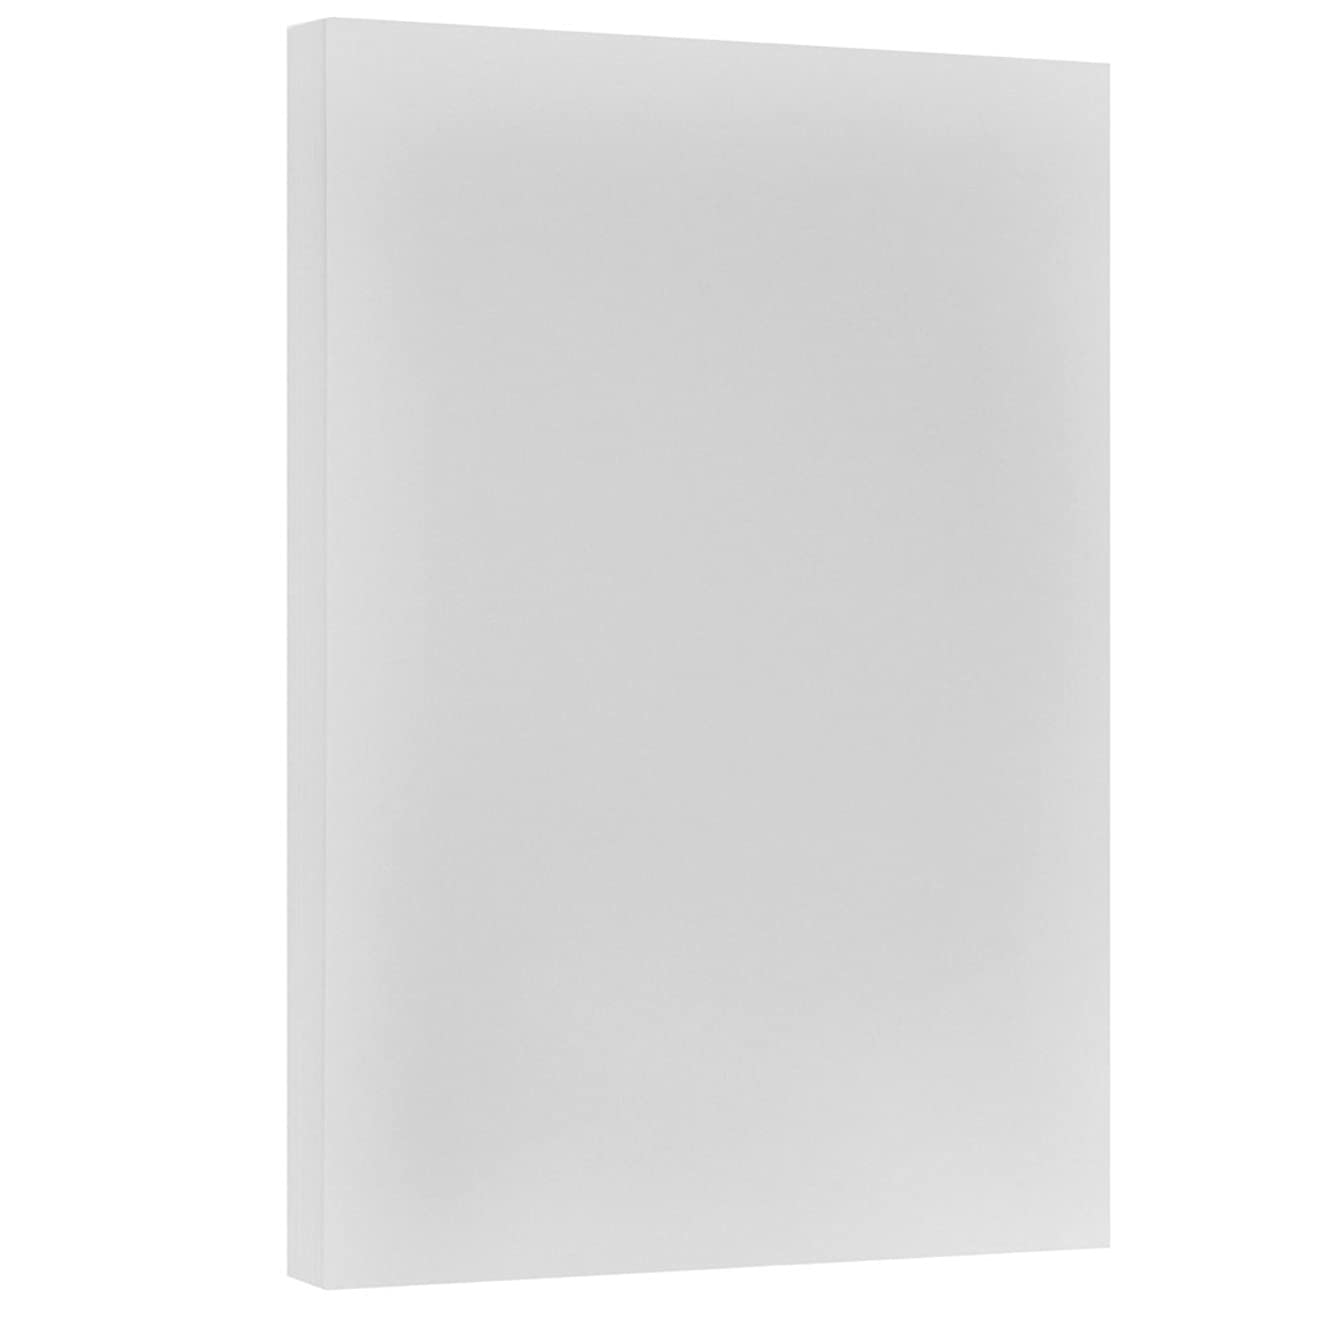 JAM PAPER Vellum Bristol 67lb Cardstock - 11 x 17 Letter Coverstock - Grey - 50 Sheets/Pack